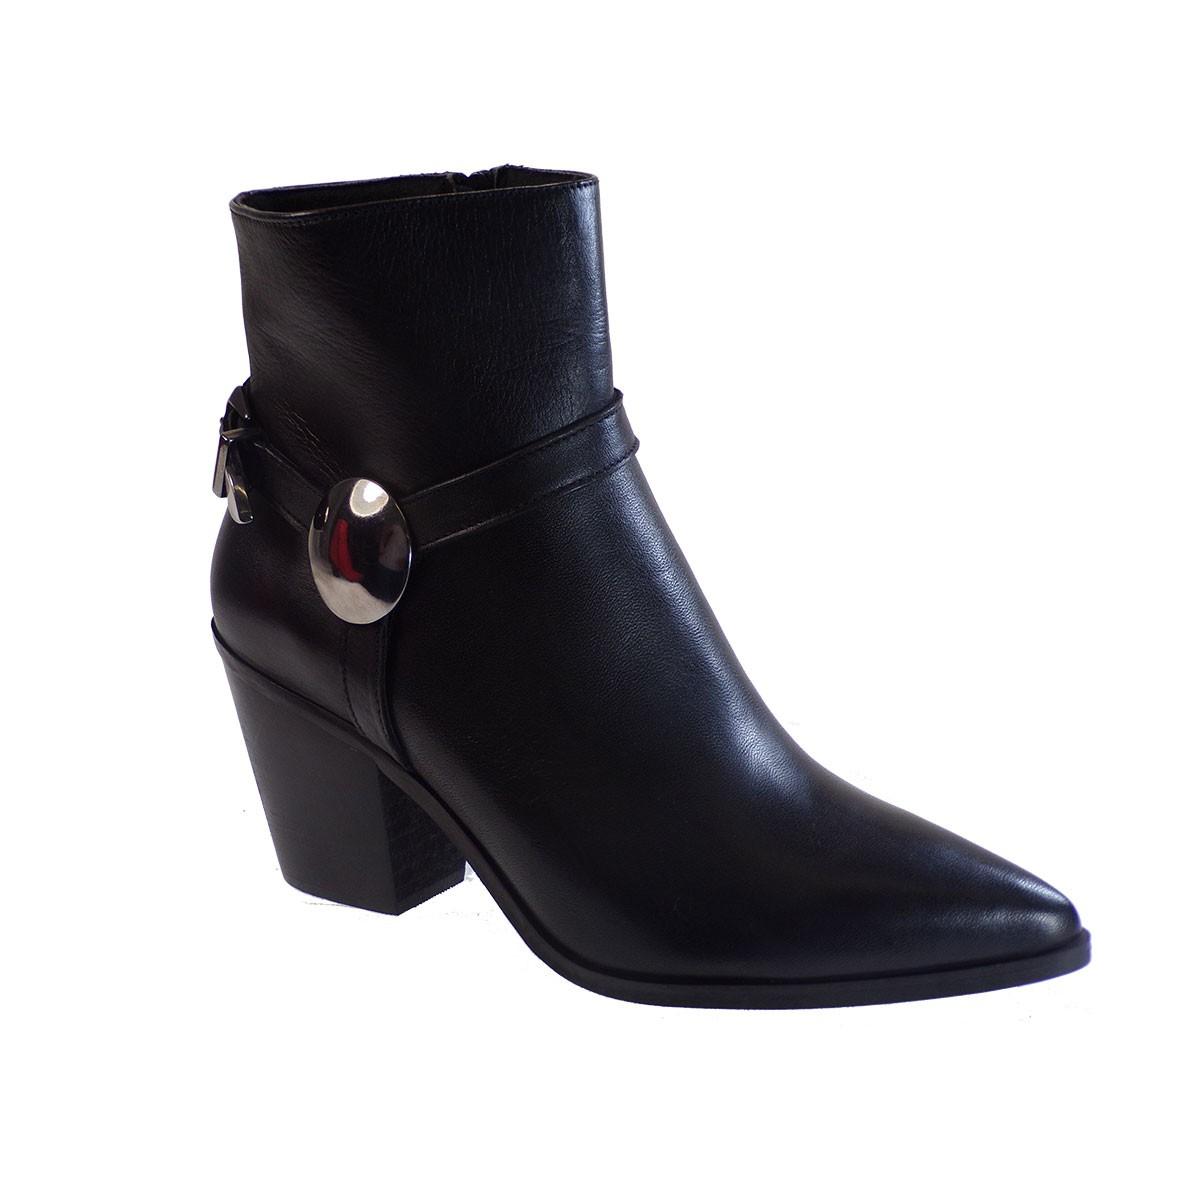 Fardoulis Shoes Γυναικεία Παπούτσια Μποτάκια K217 Μαύρο Δέρμα